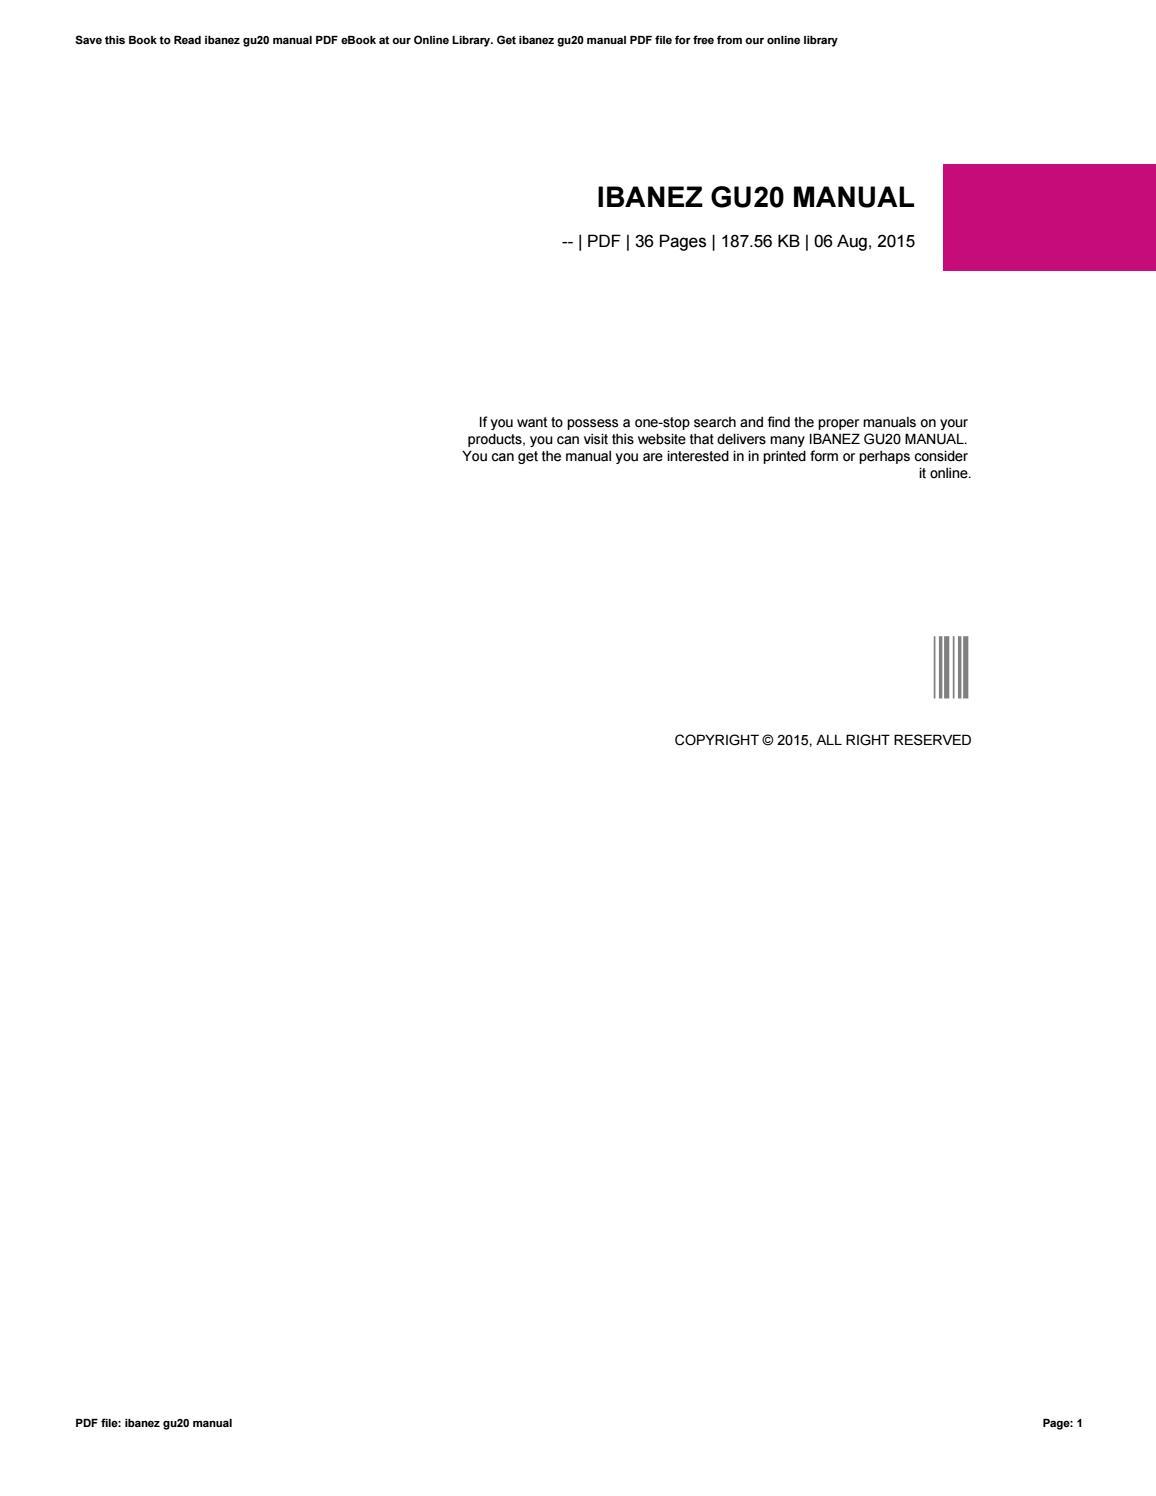 ibanez gu20 manual by furusato2 issuu rh issuu com Ibanez Model Identification Ibanez Foot Pedals